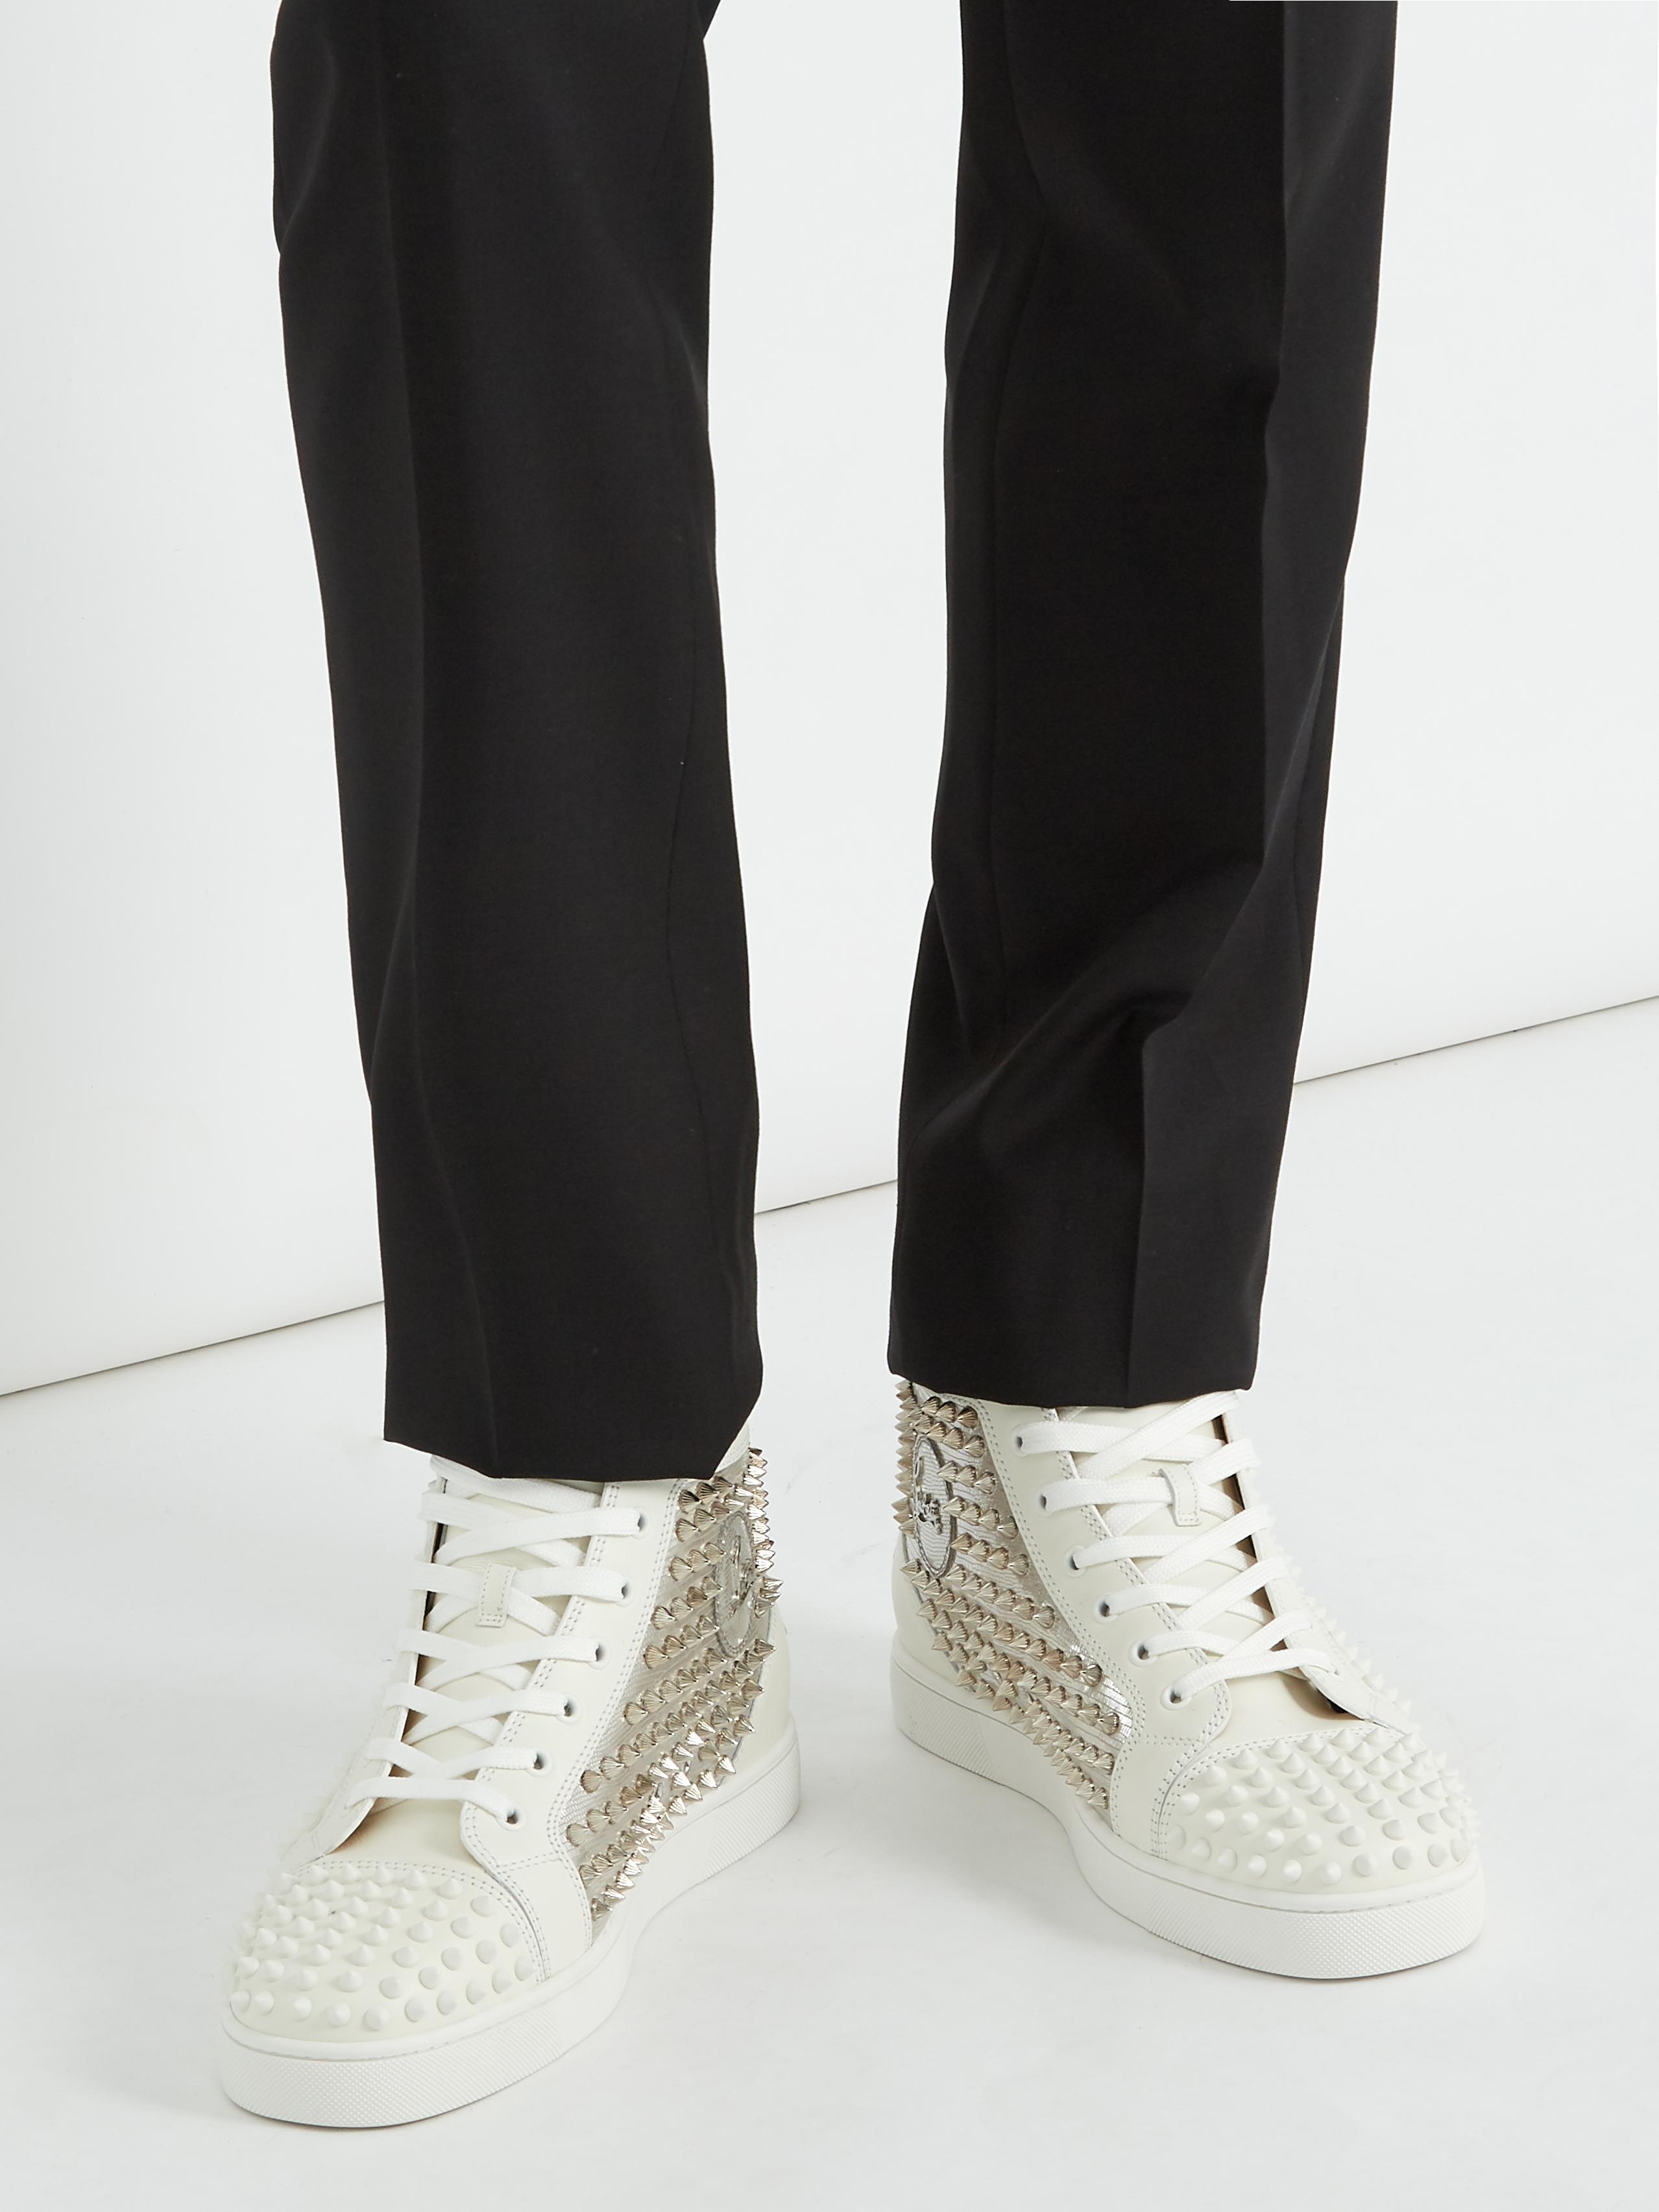 buy online 6b888 0880b Christian Louboutin Metallic Yang Louis High-top Spike-embellished Trainers  for men